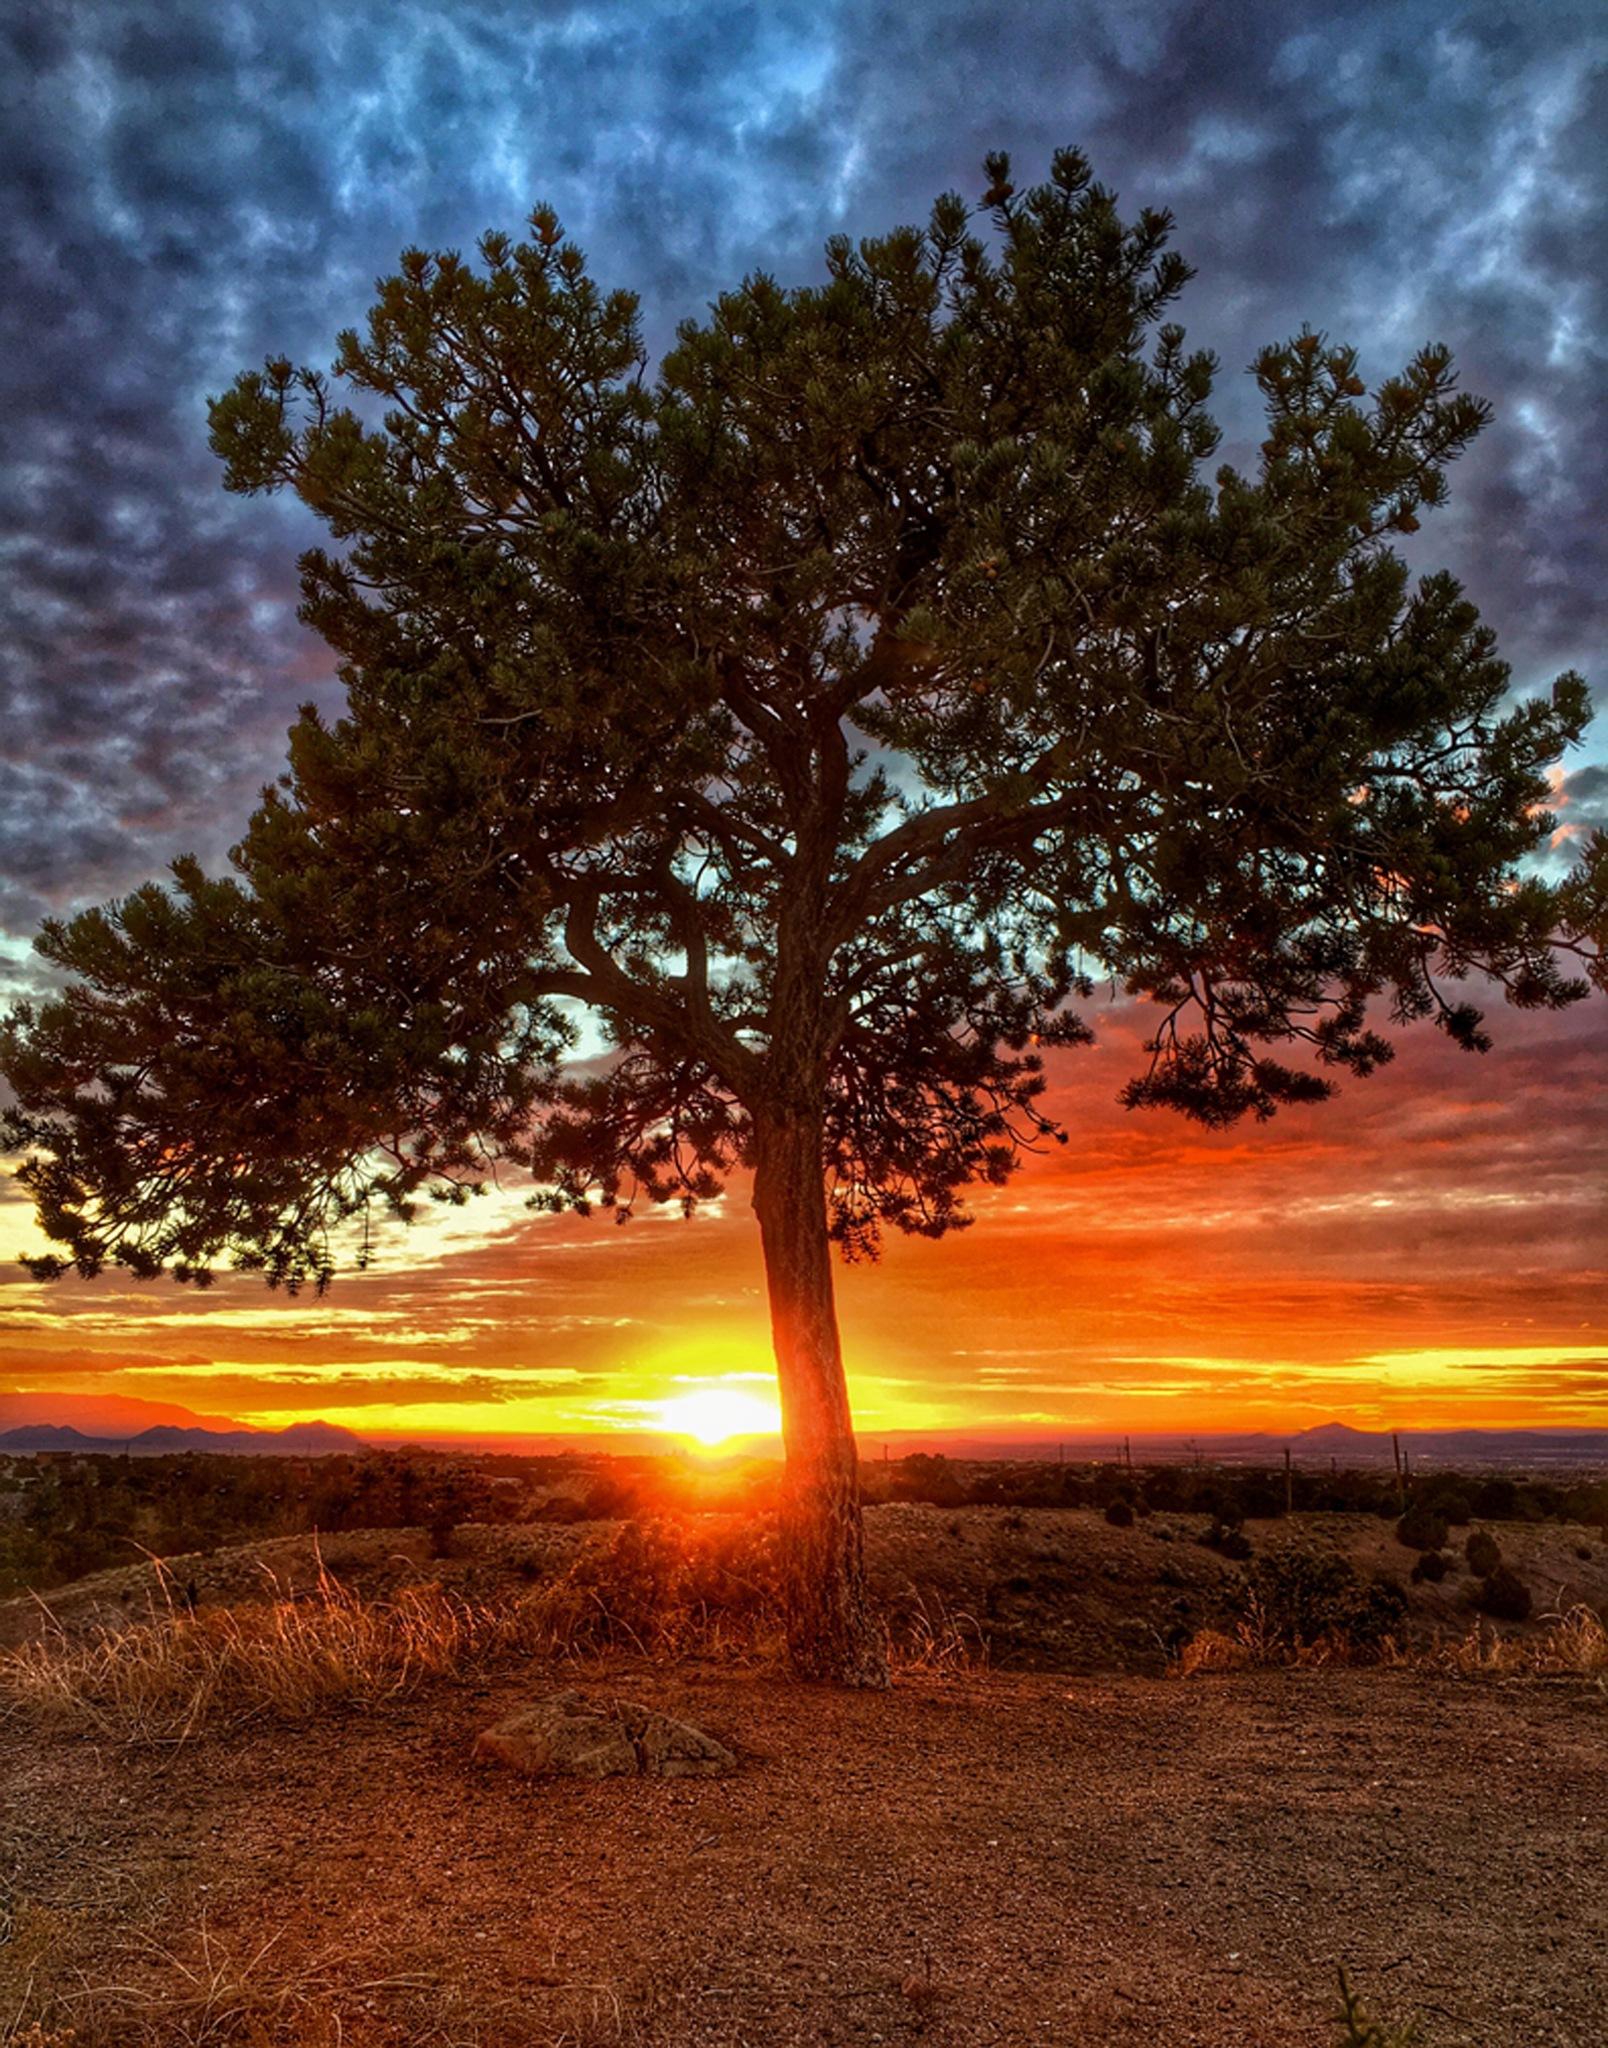 THE BURNING TREE by Bill Hitz